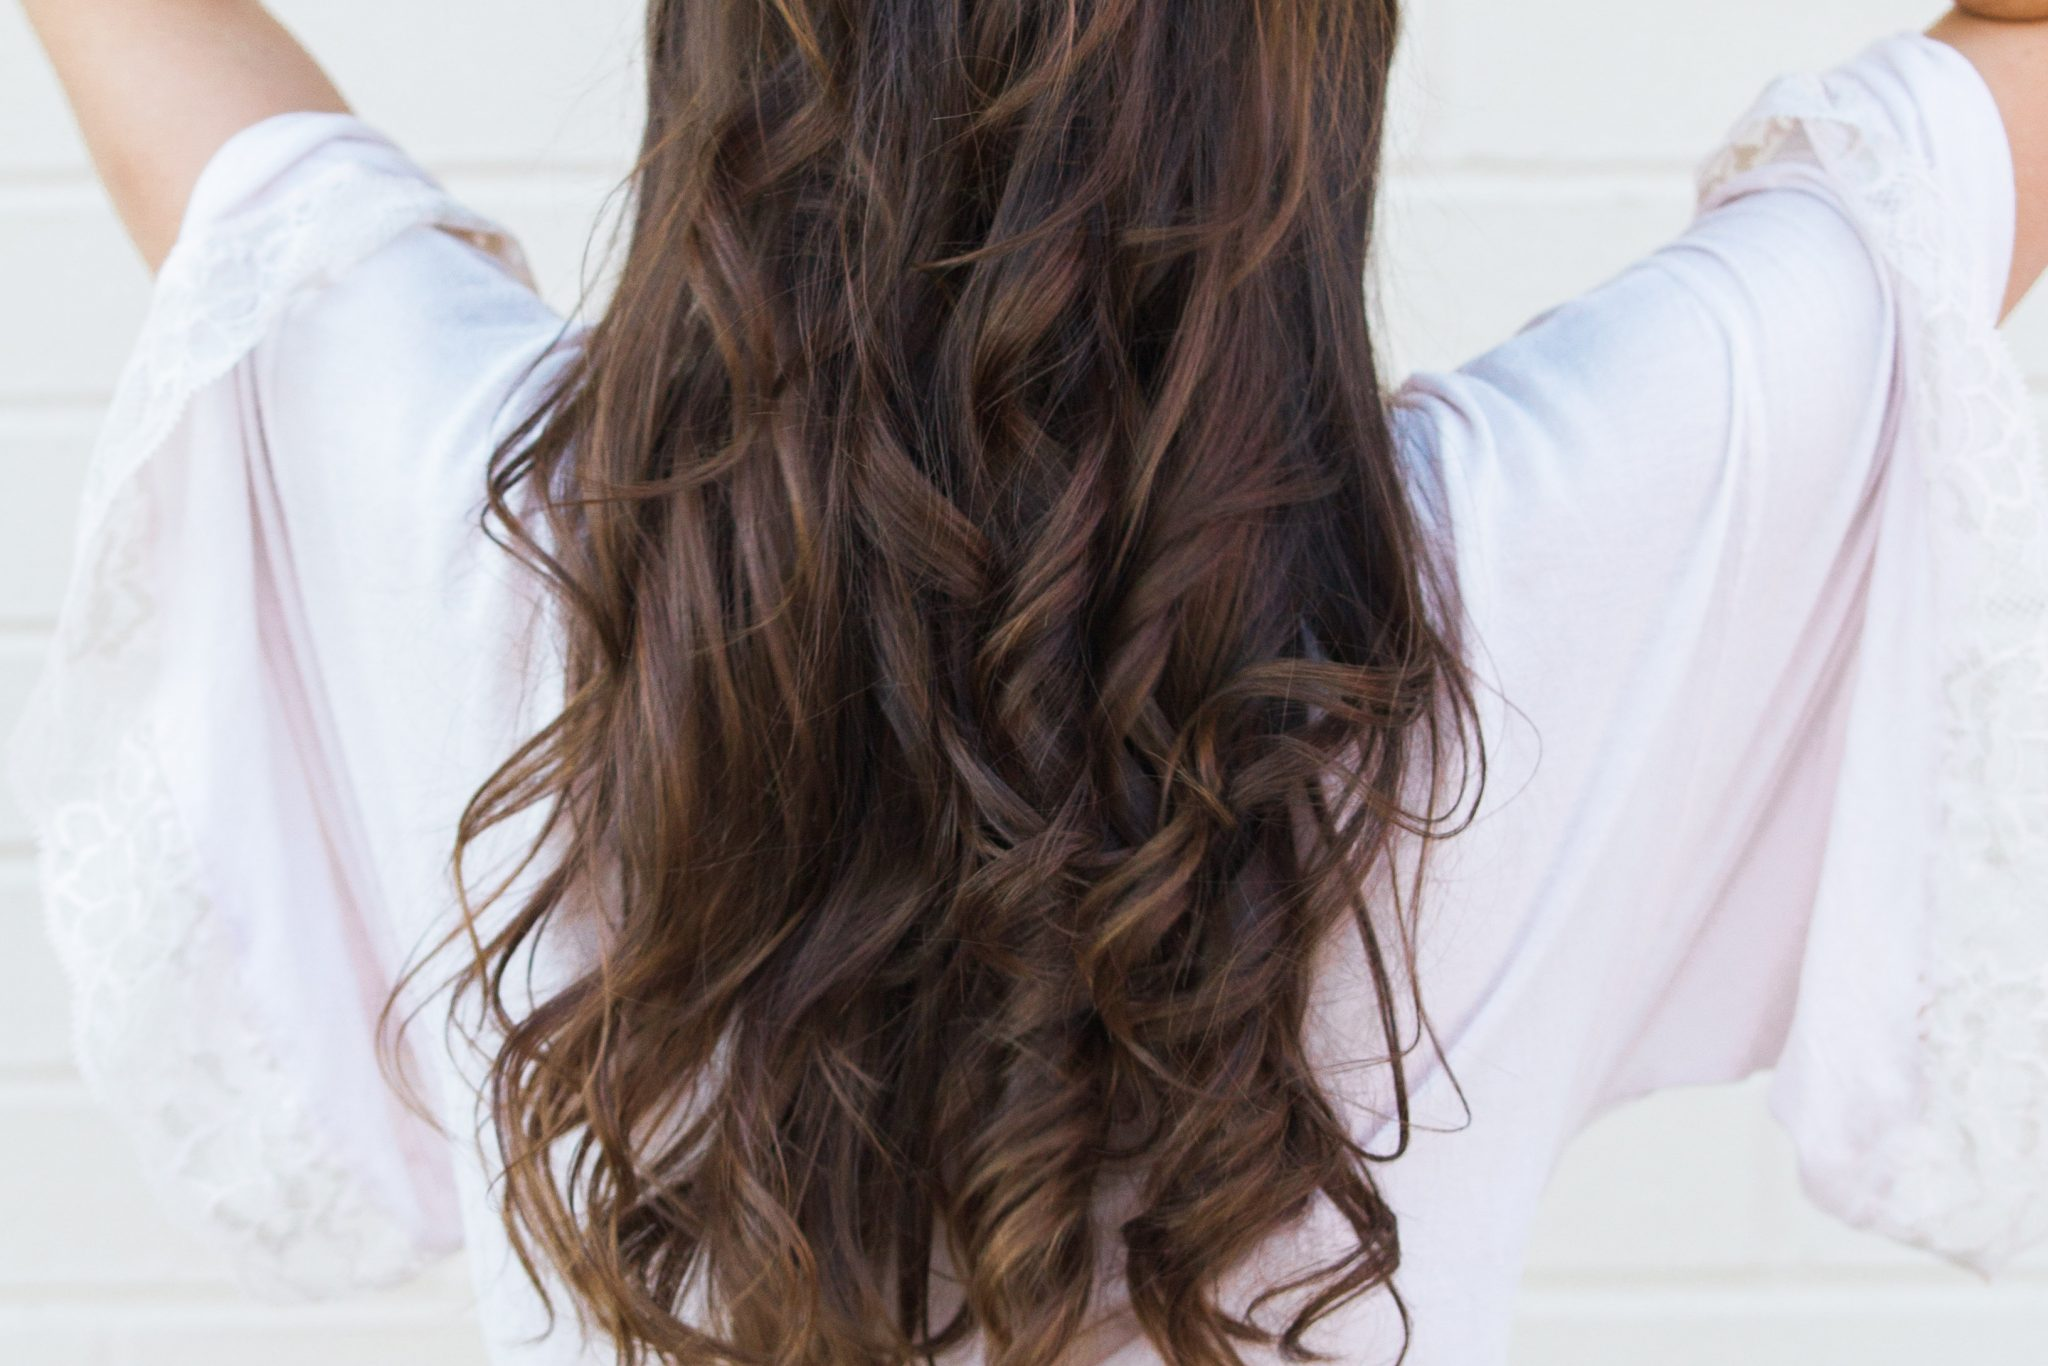 Dove Regenerative Nourishment shampoo and conditioner review, summer hair, dark hair, healthy hair tips, summer hair tips, dark hair for summer